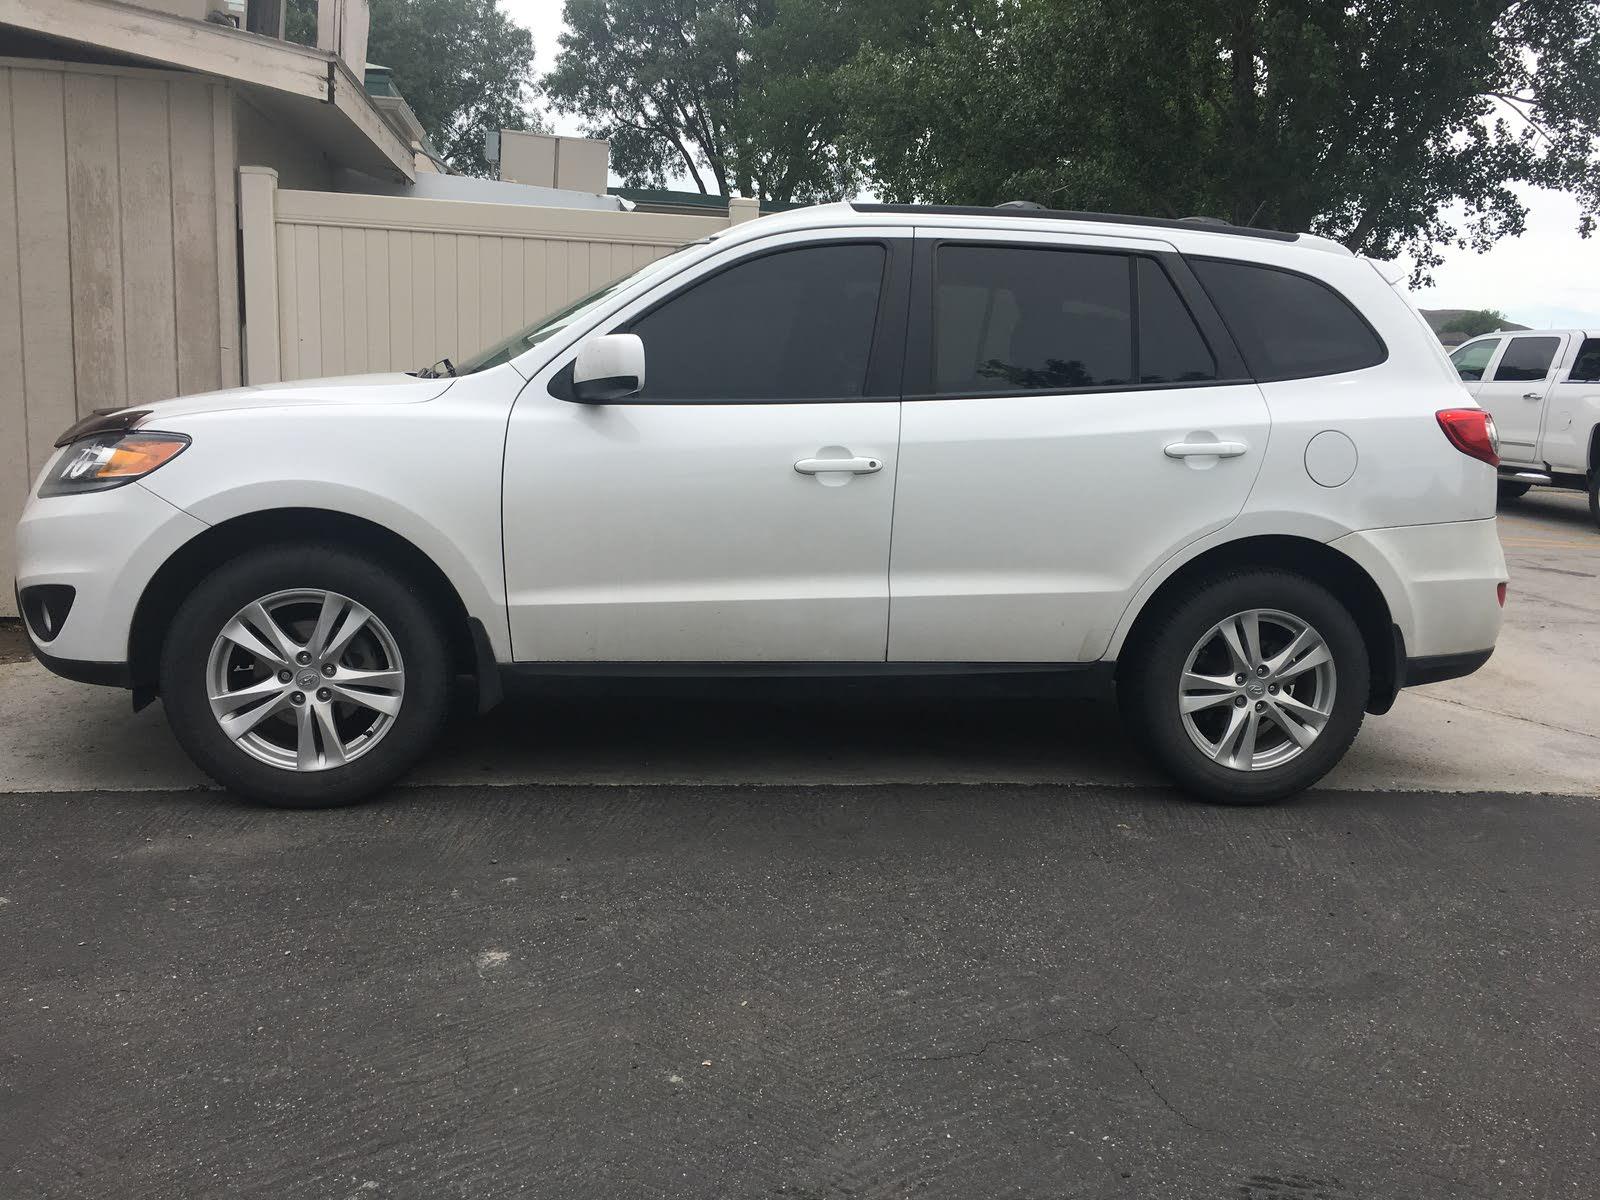 2012 Hyundai Santa Fe Overview Cargurus